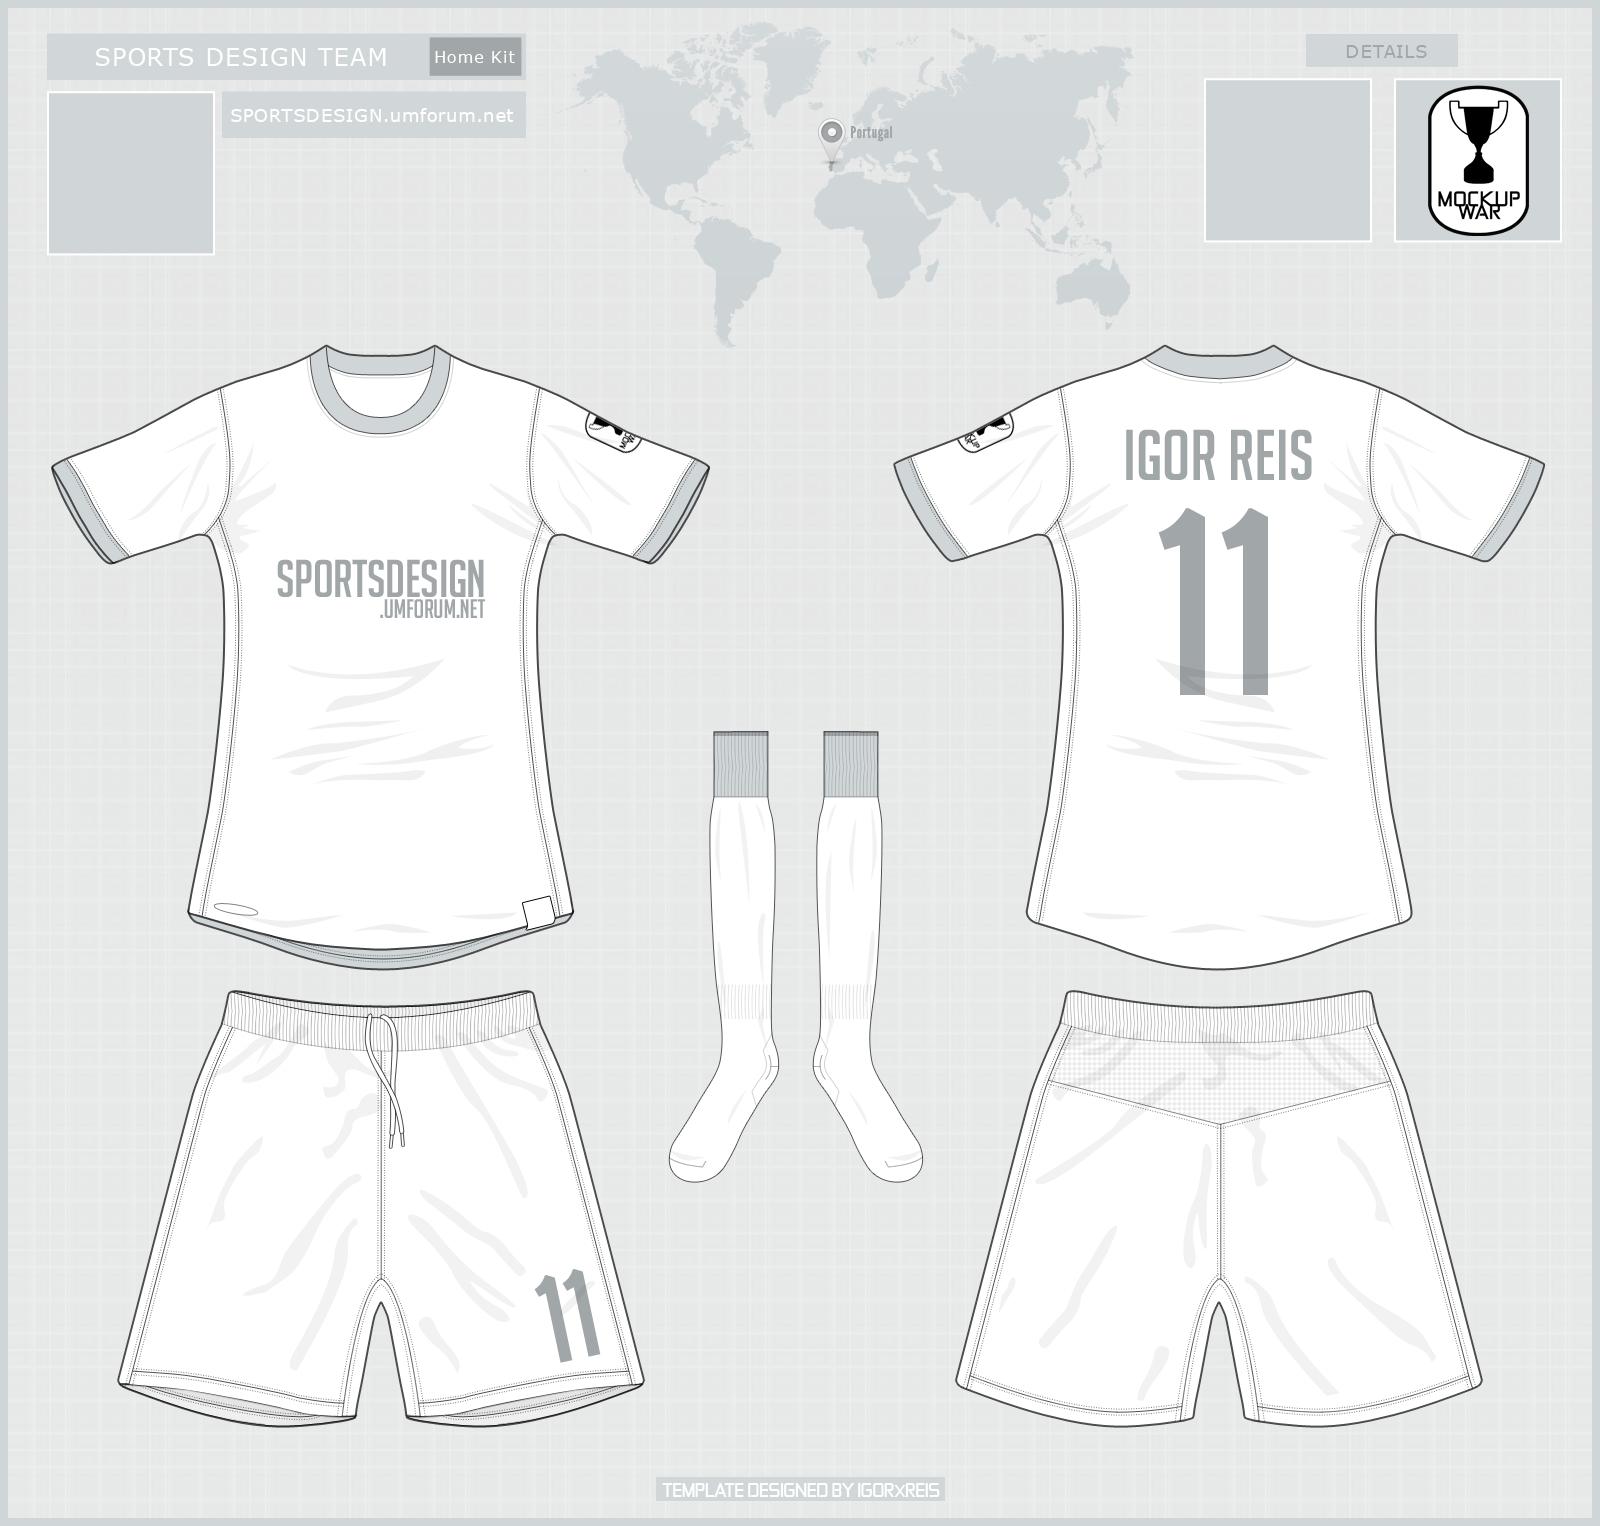 Oficial Template Sports Design Portugal by IGORxREIS